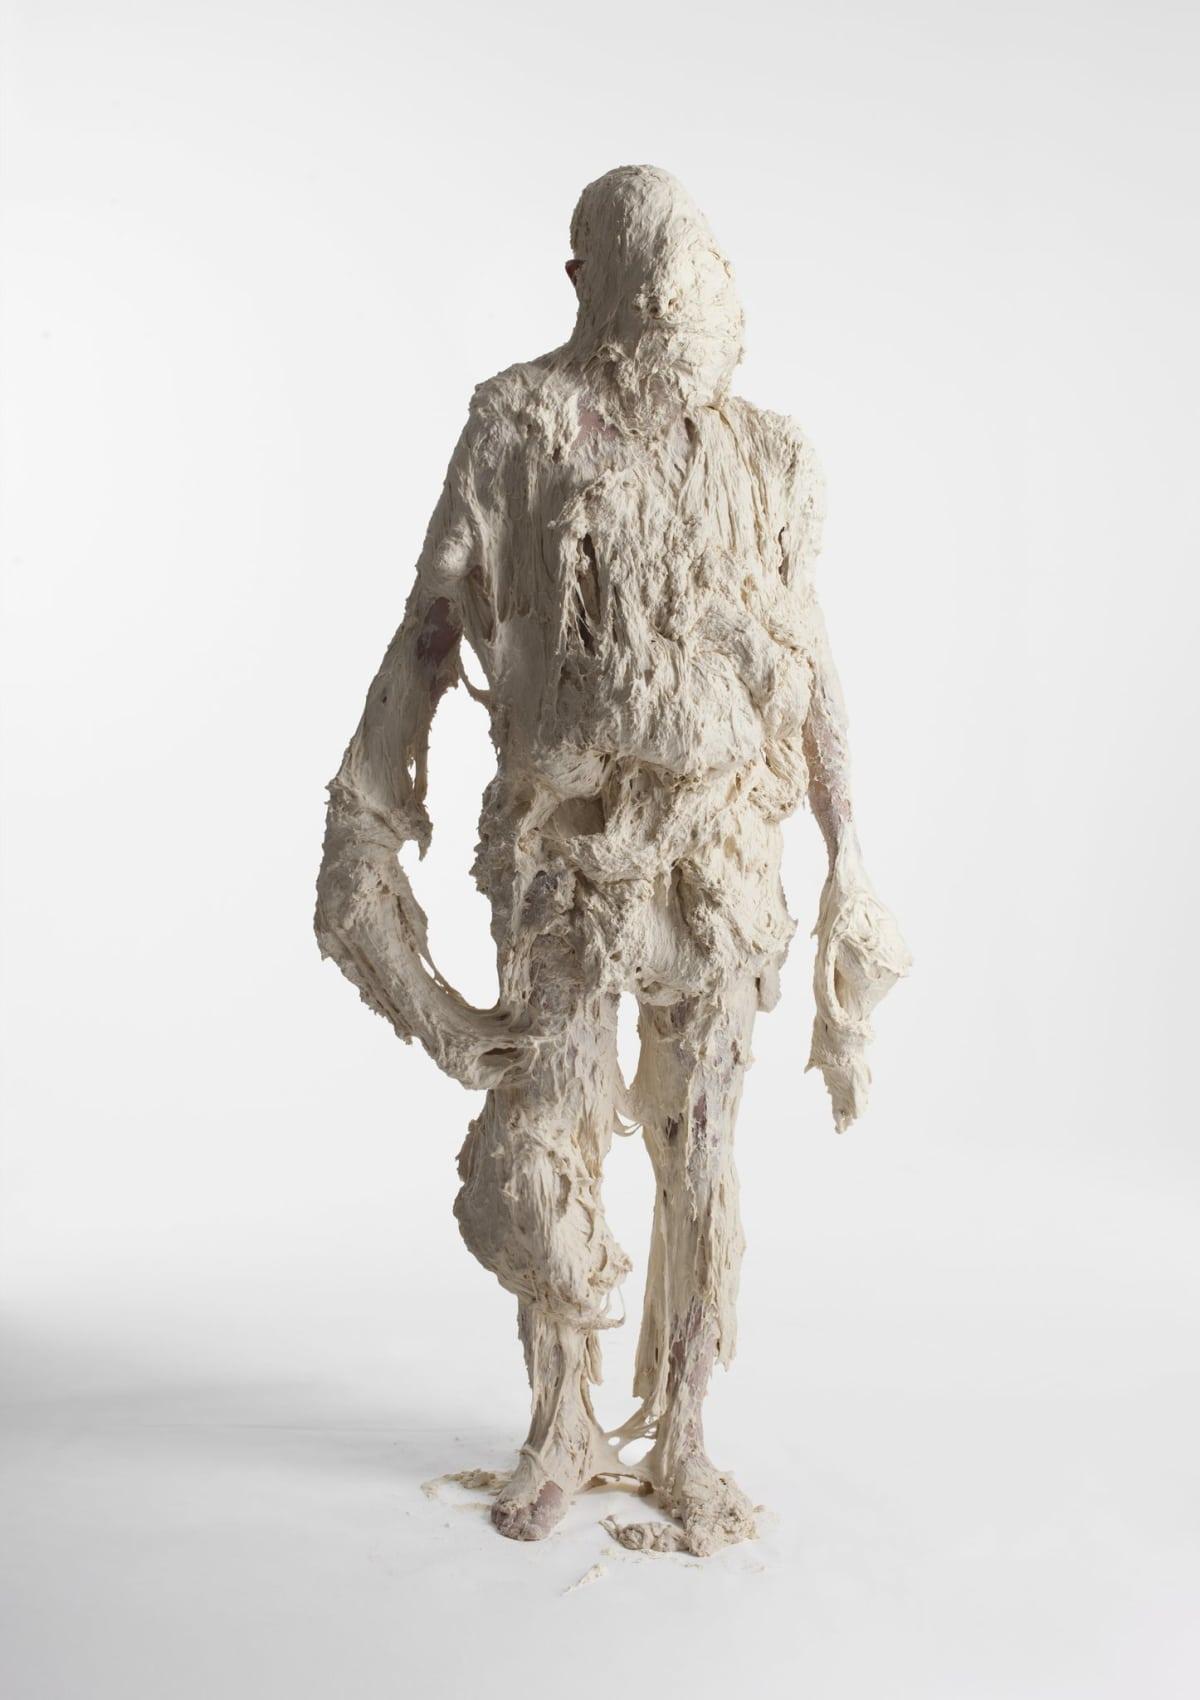 Marcus Coates, Mayfly, Ephemeroptera (Subimago stage) Self Portrait, flour and water, 2013